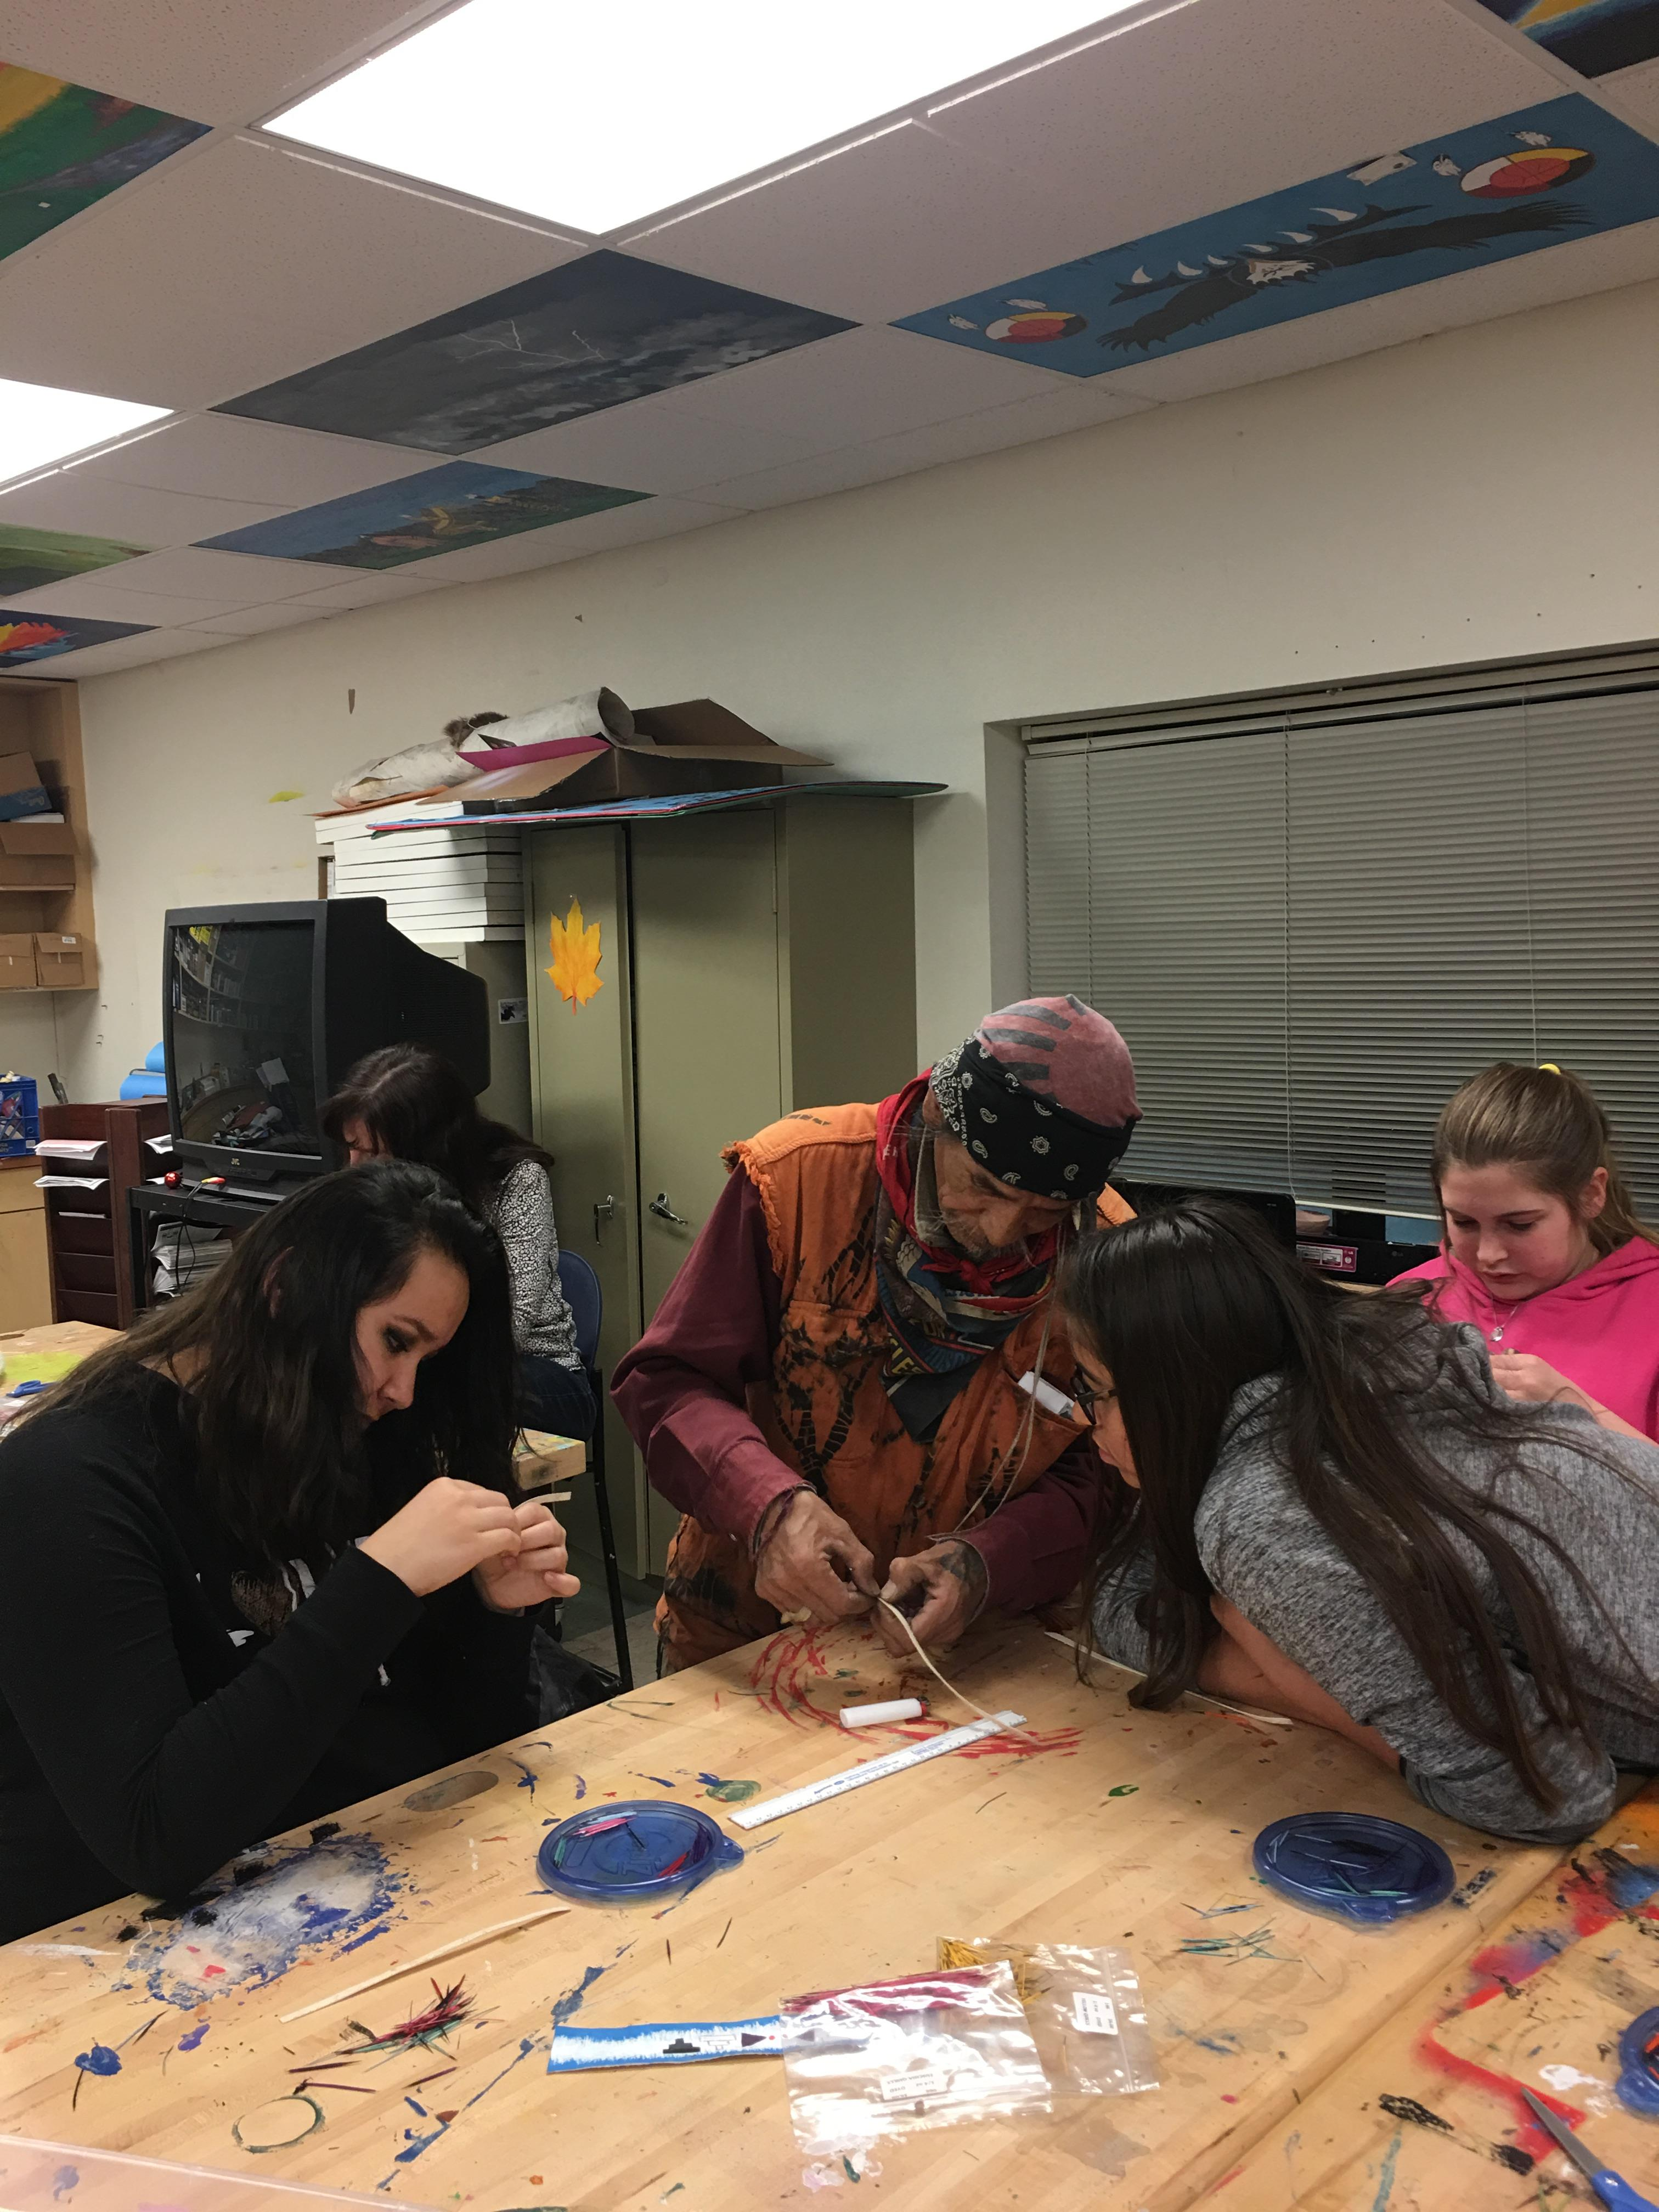 Cheyenne River Youth Project Will Host Three New Lakota Culture Camps This Spring Through its Waniyetu Wowapi Lakota Youth Arts & Culture Institute